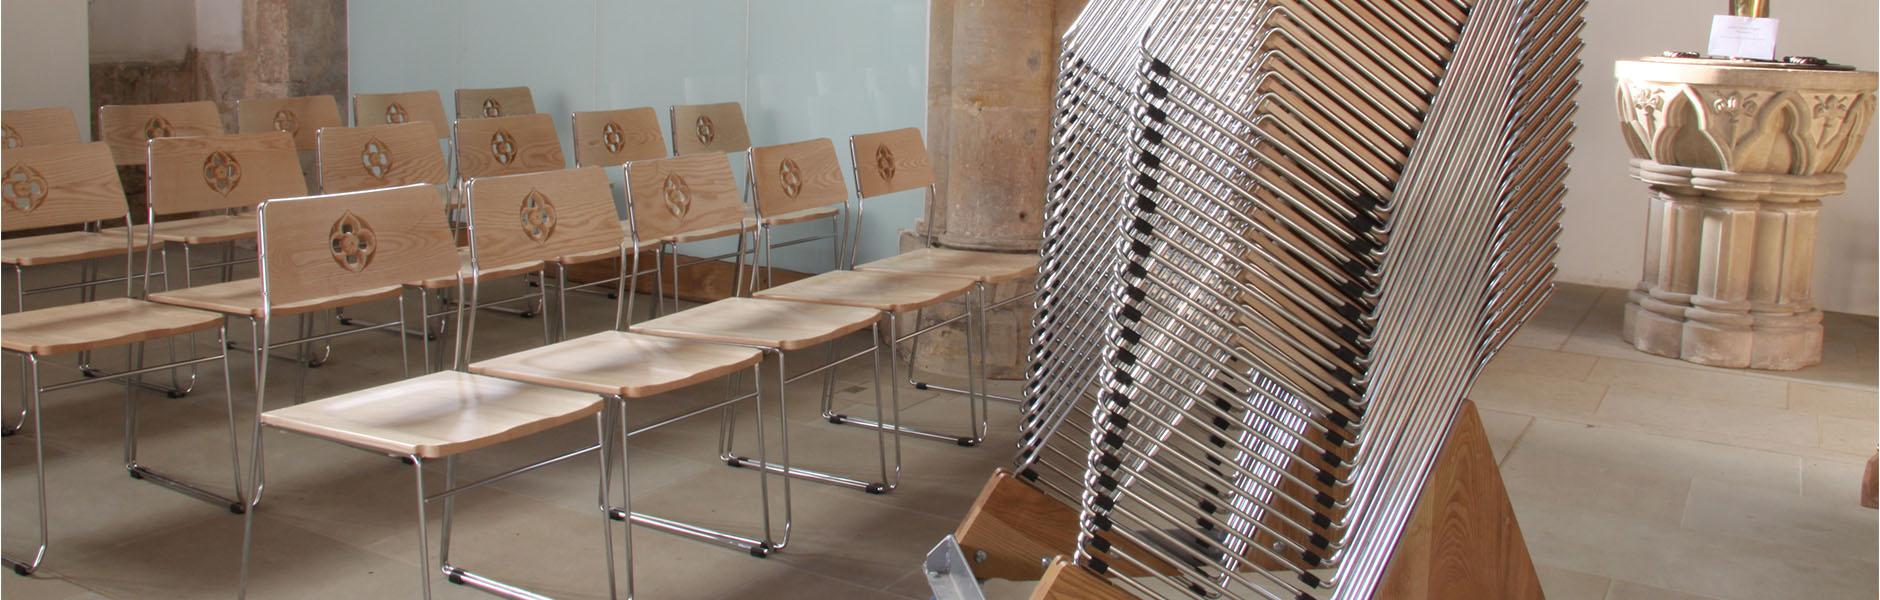 ICS innovative design metal frame chairs